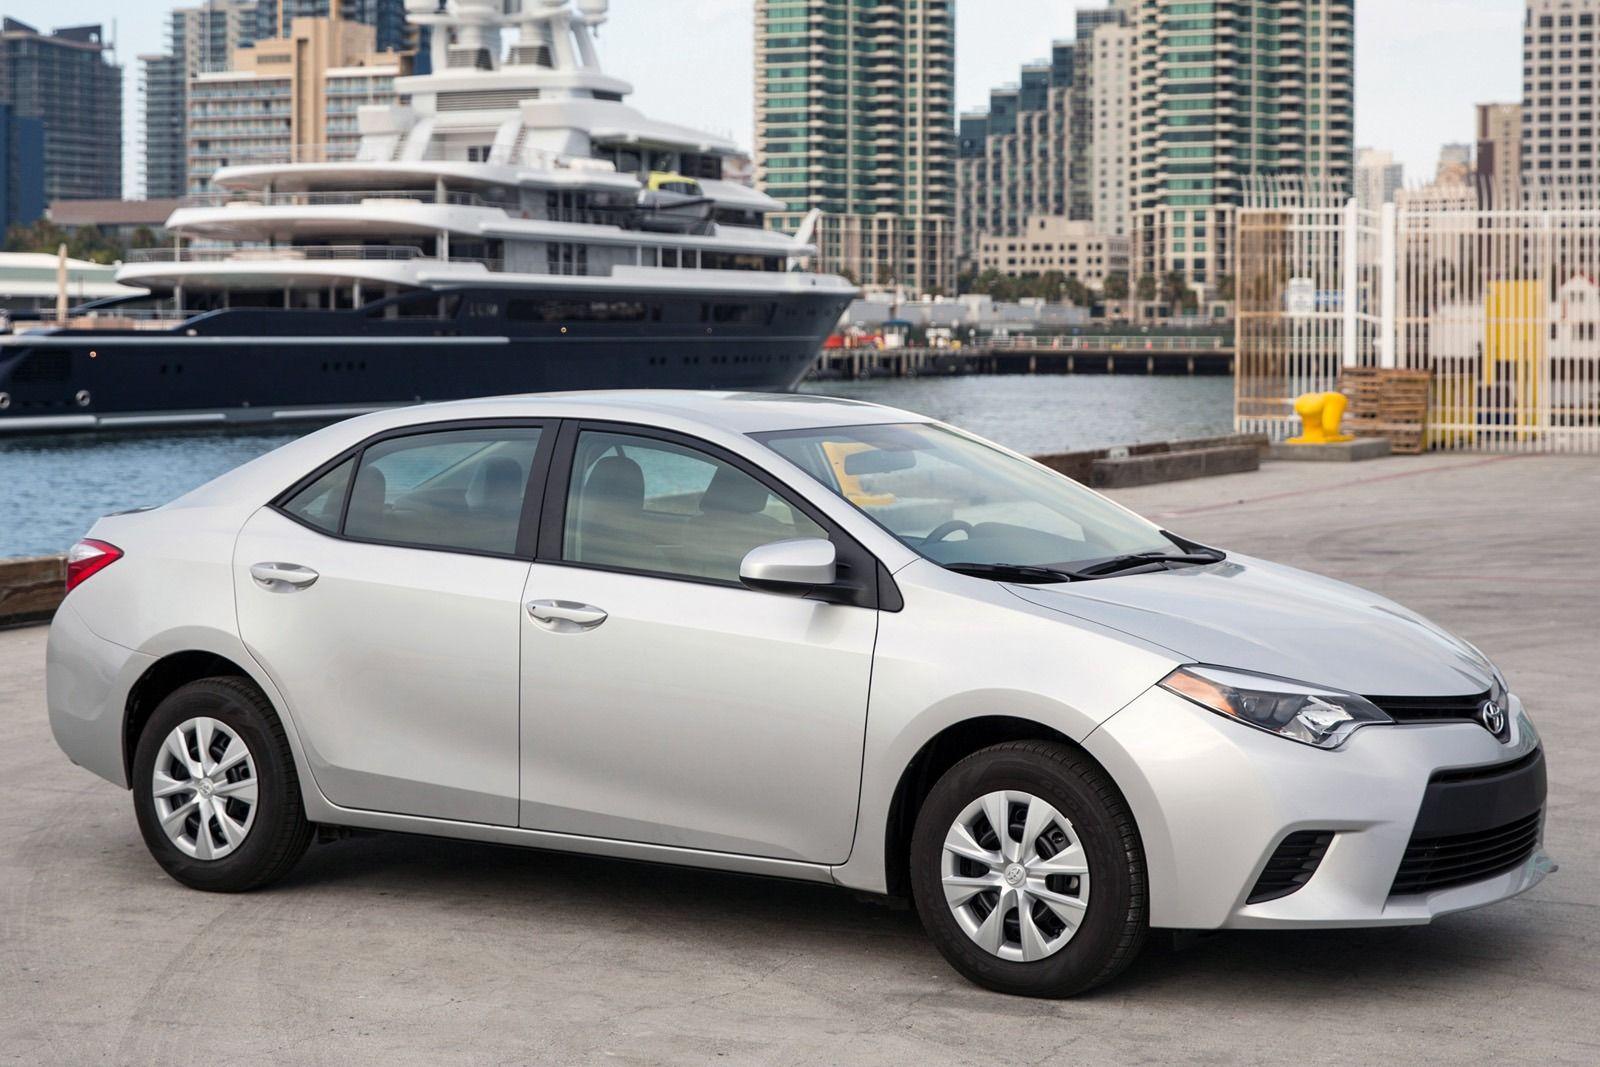 2016 Toyota Corolla Precio | newhairstylesformen2014.com